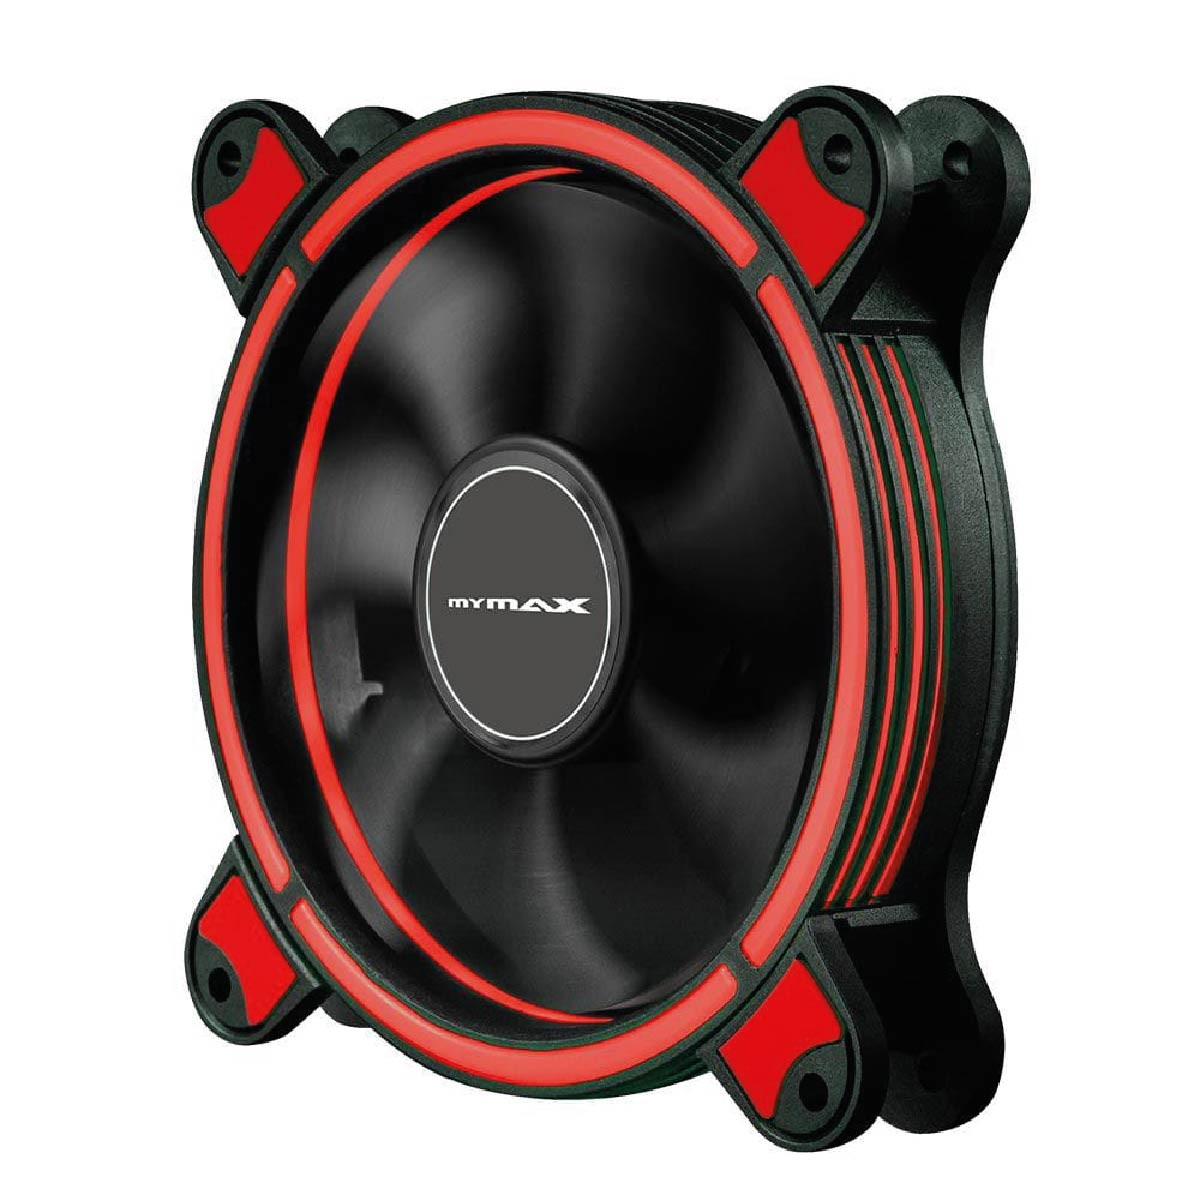 Fan Cooler Gamer 120mm Mymax Spectrum Led Vermelho Para Pc Gabinete